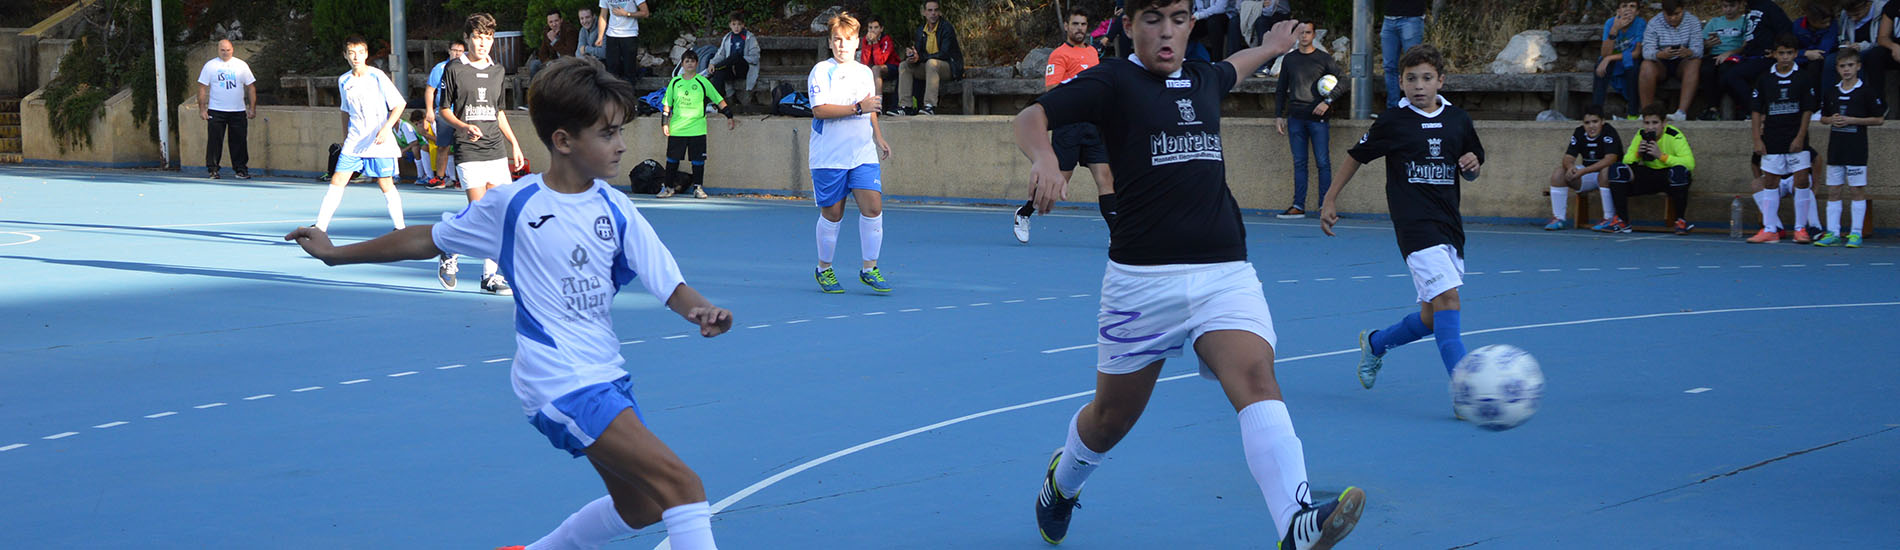 Escuela de Fútbol-sala